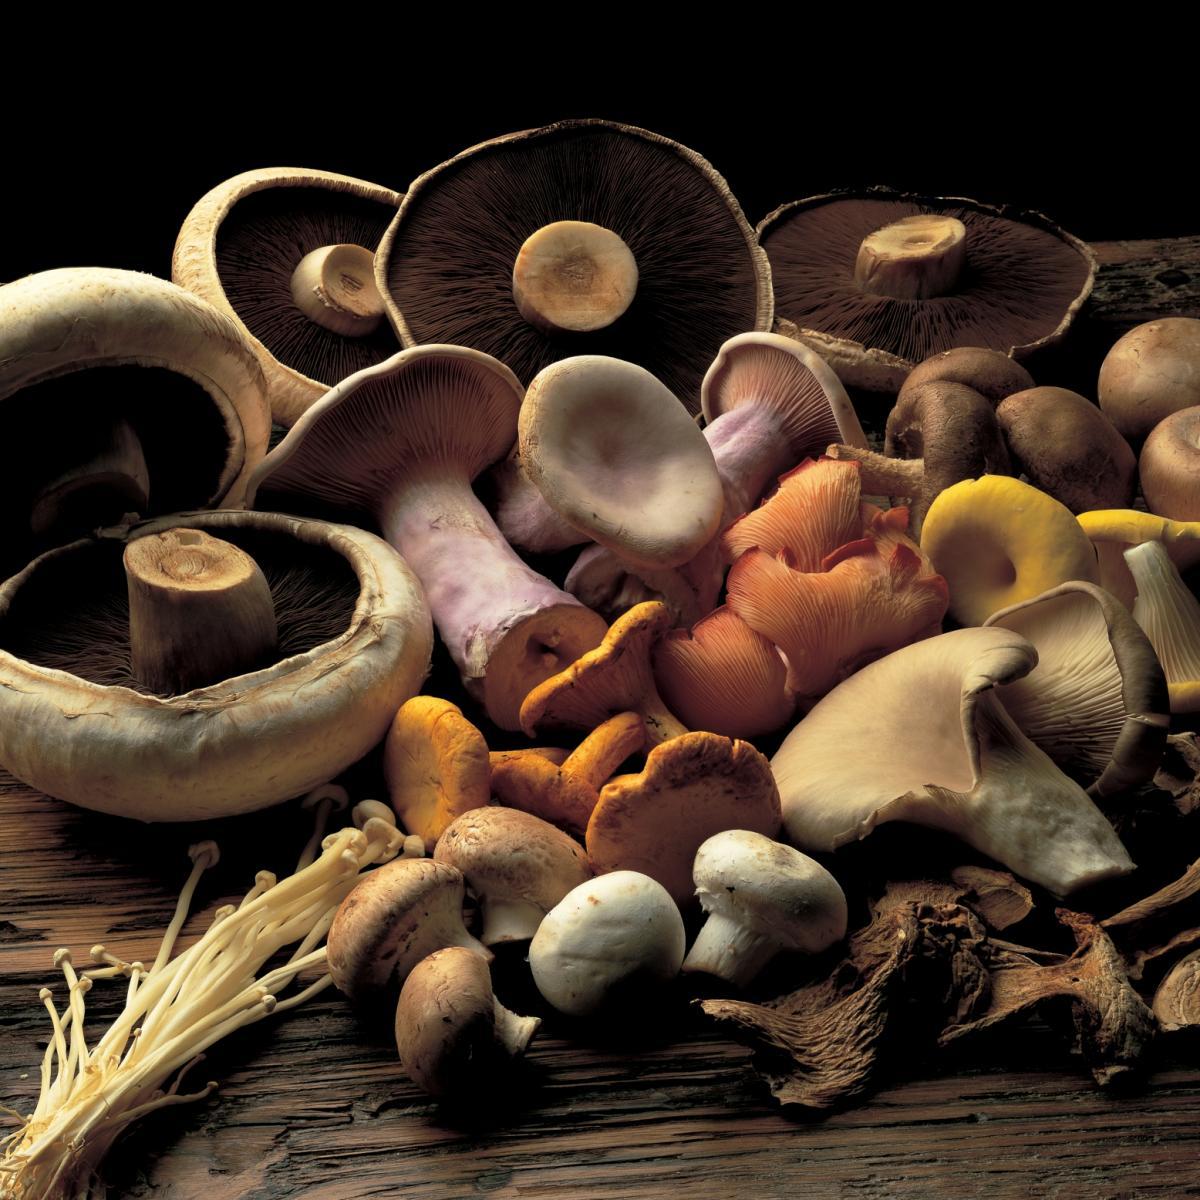 Ingredient soup mushrooms